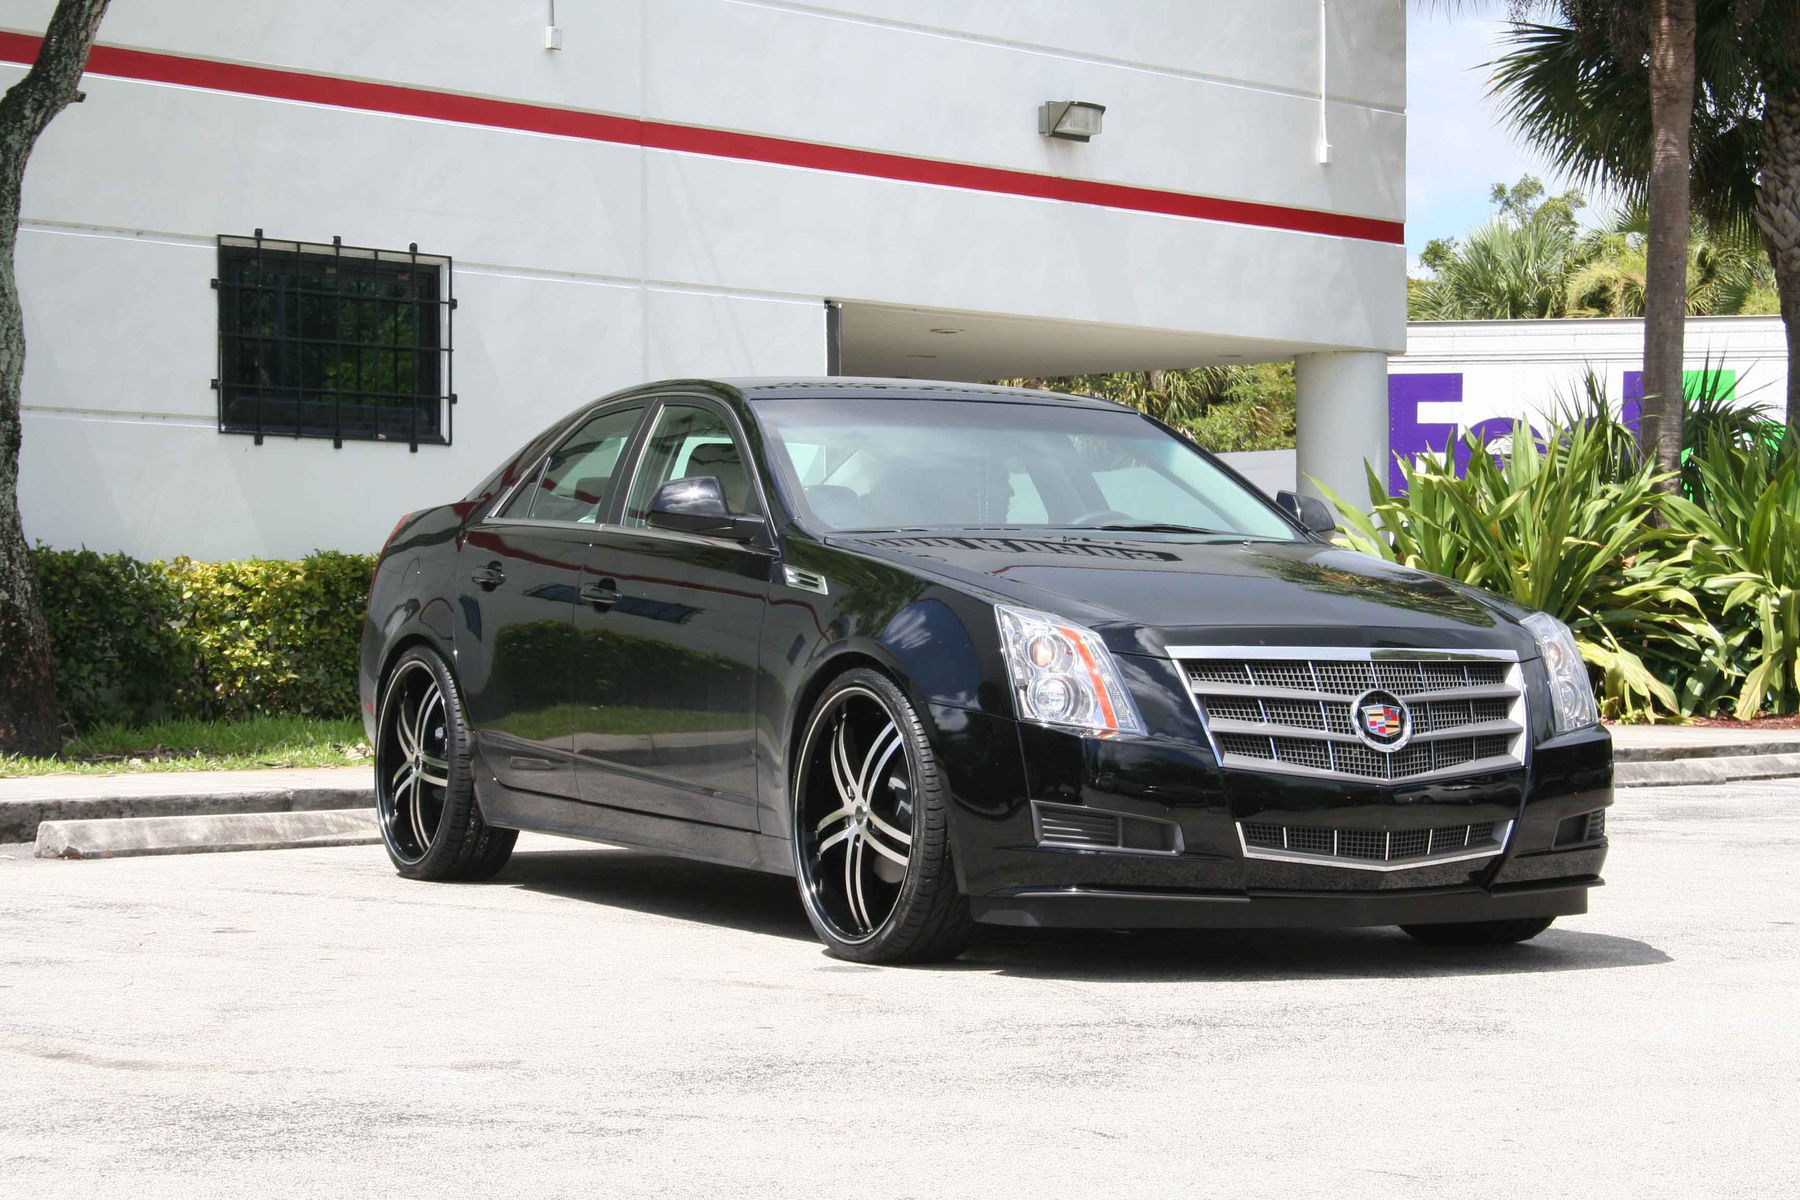 2010 Cadillac CTS-V | Cadillac CTS-V